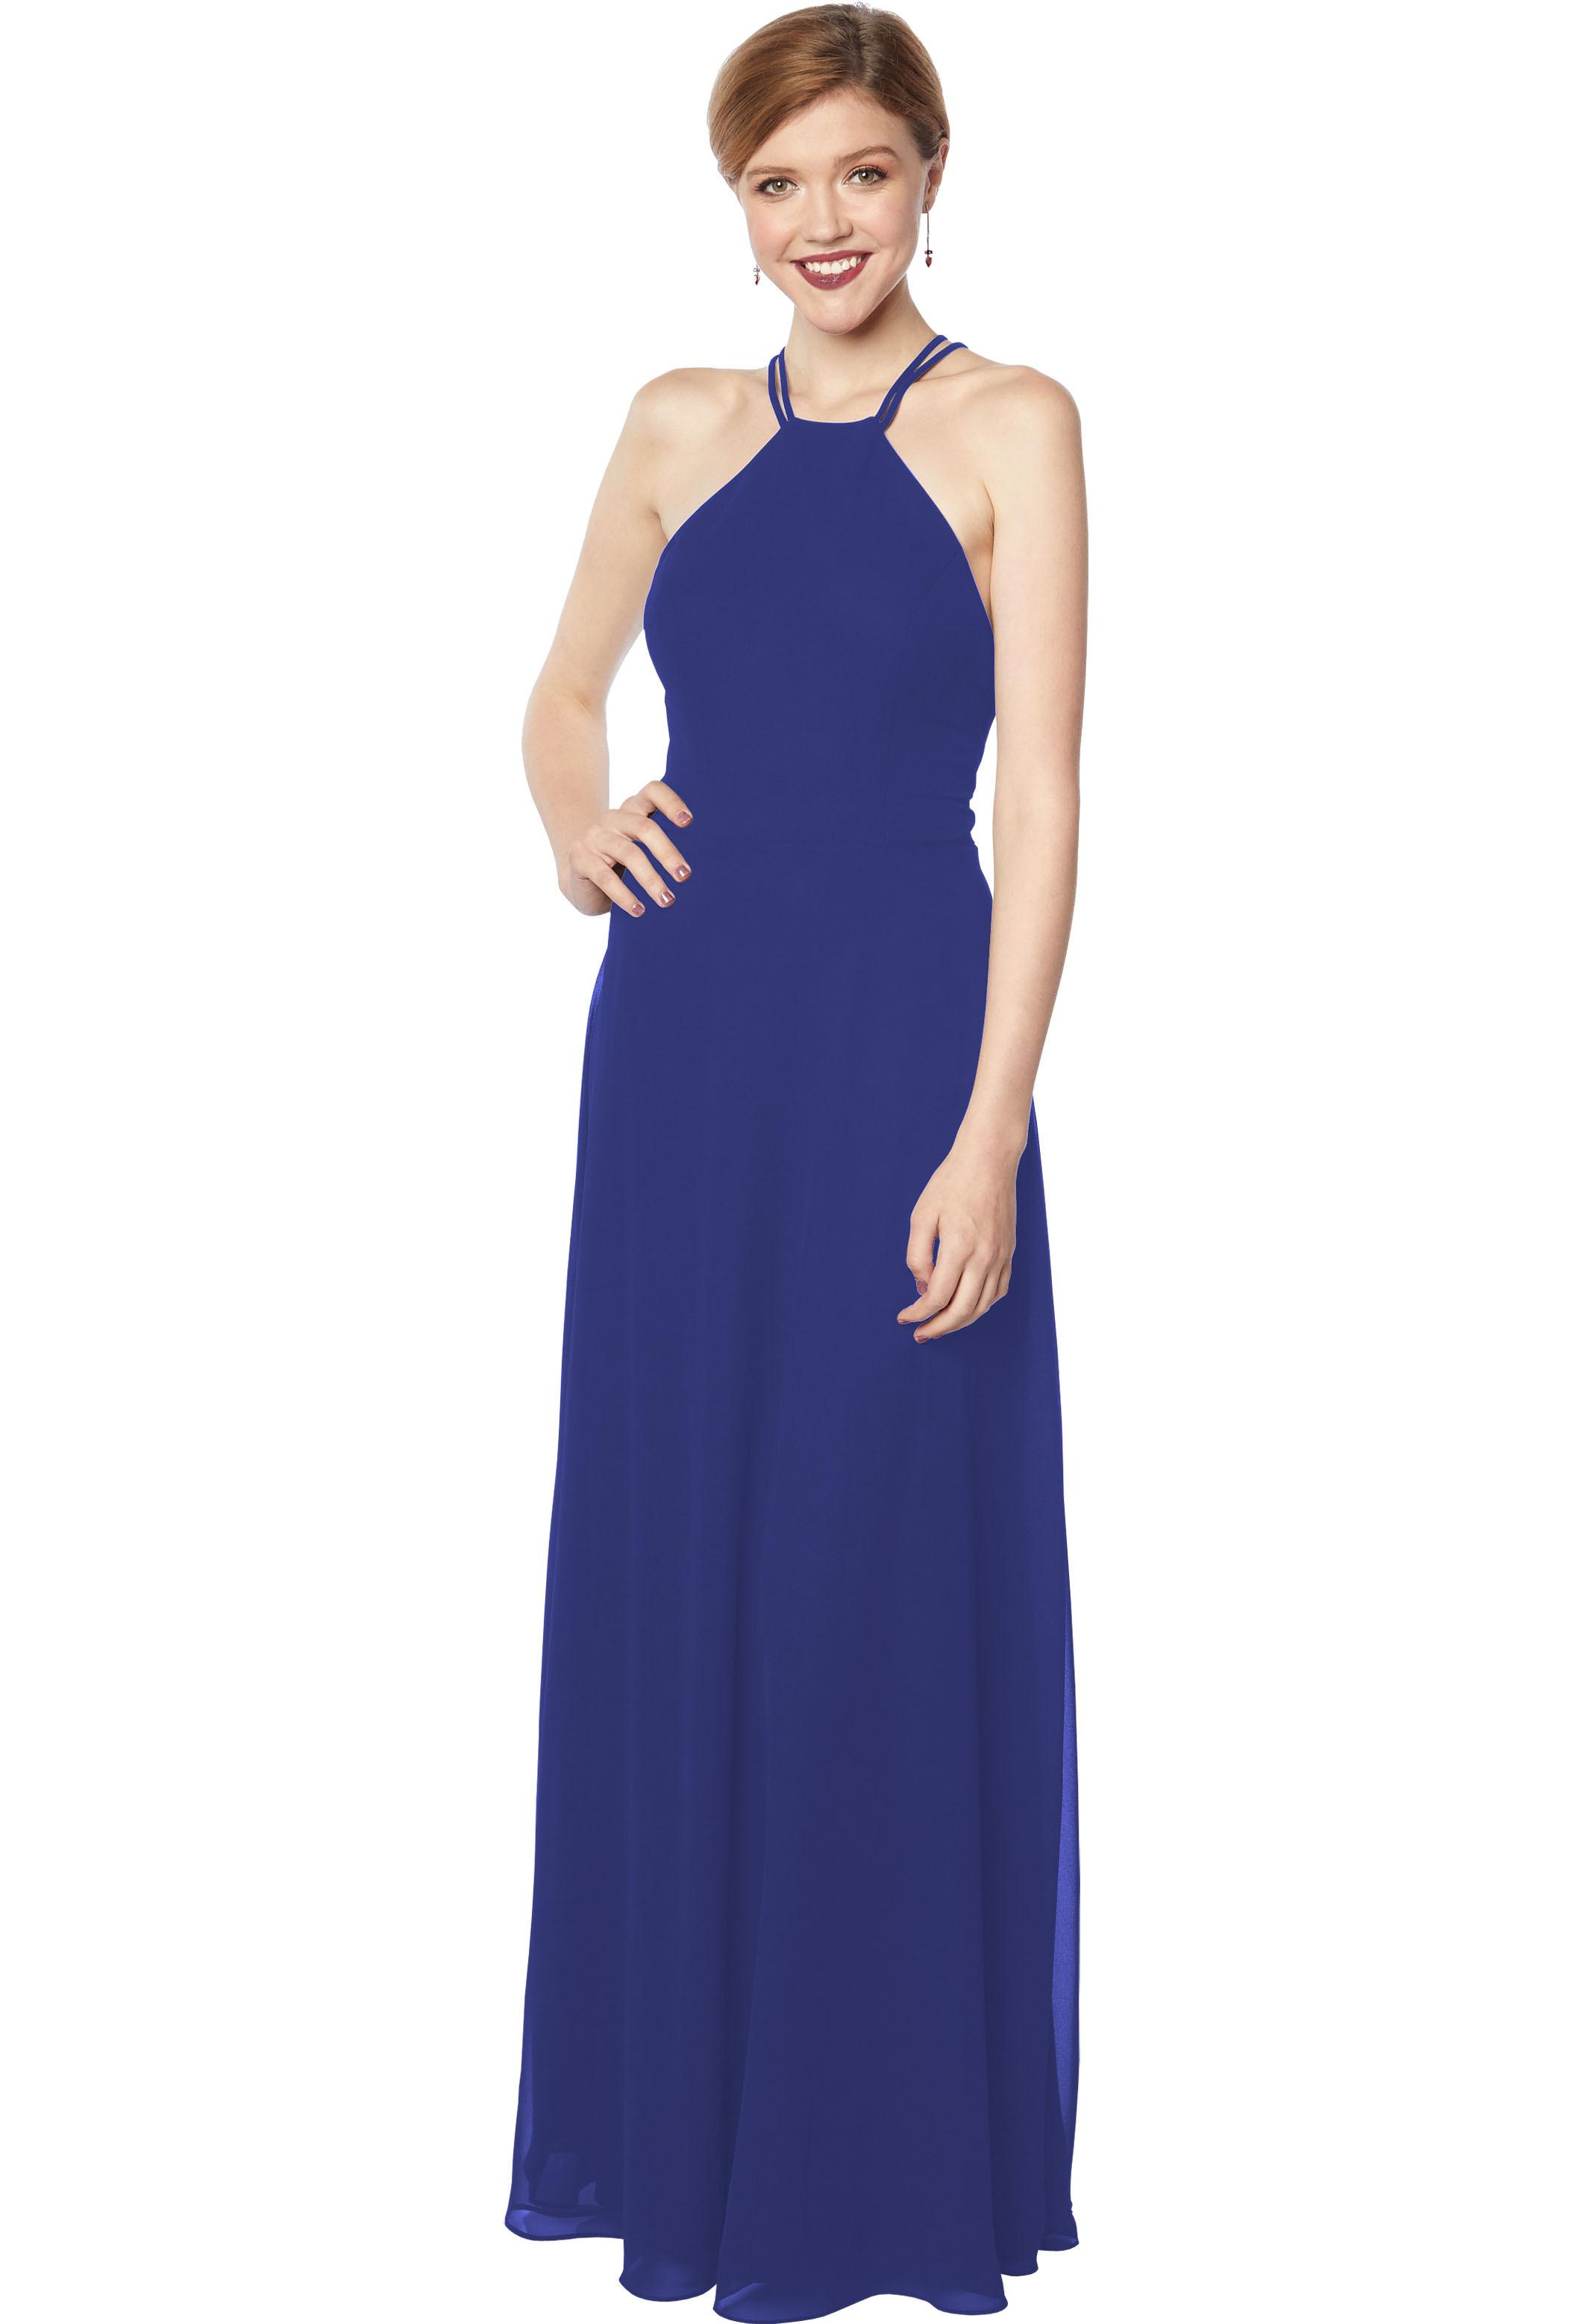 Bill Levkoff MARINE Chiffon Sleeveless A-line gown, $178.00 Front